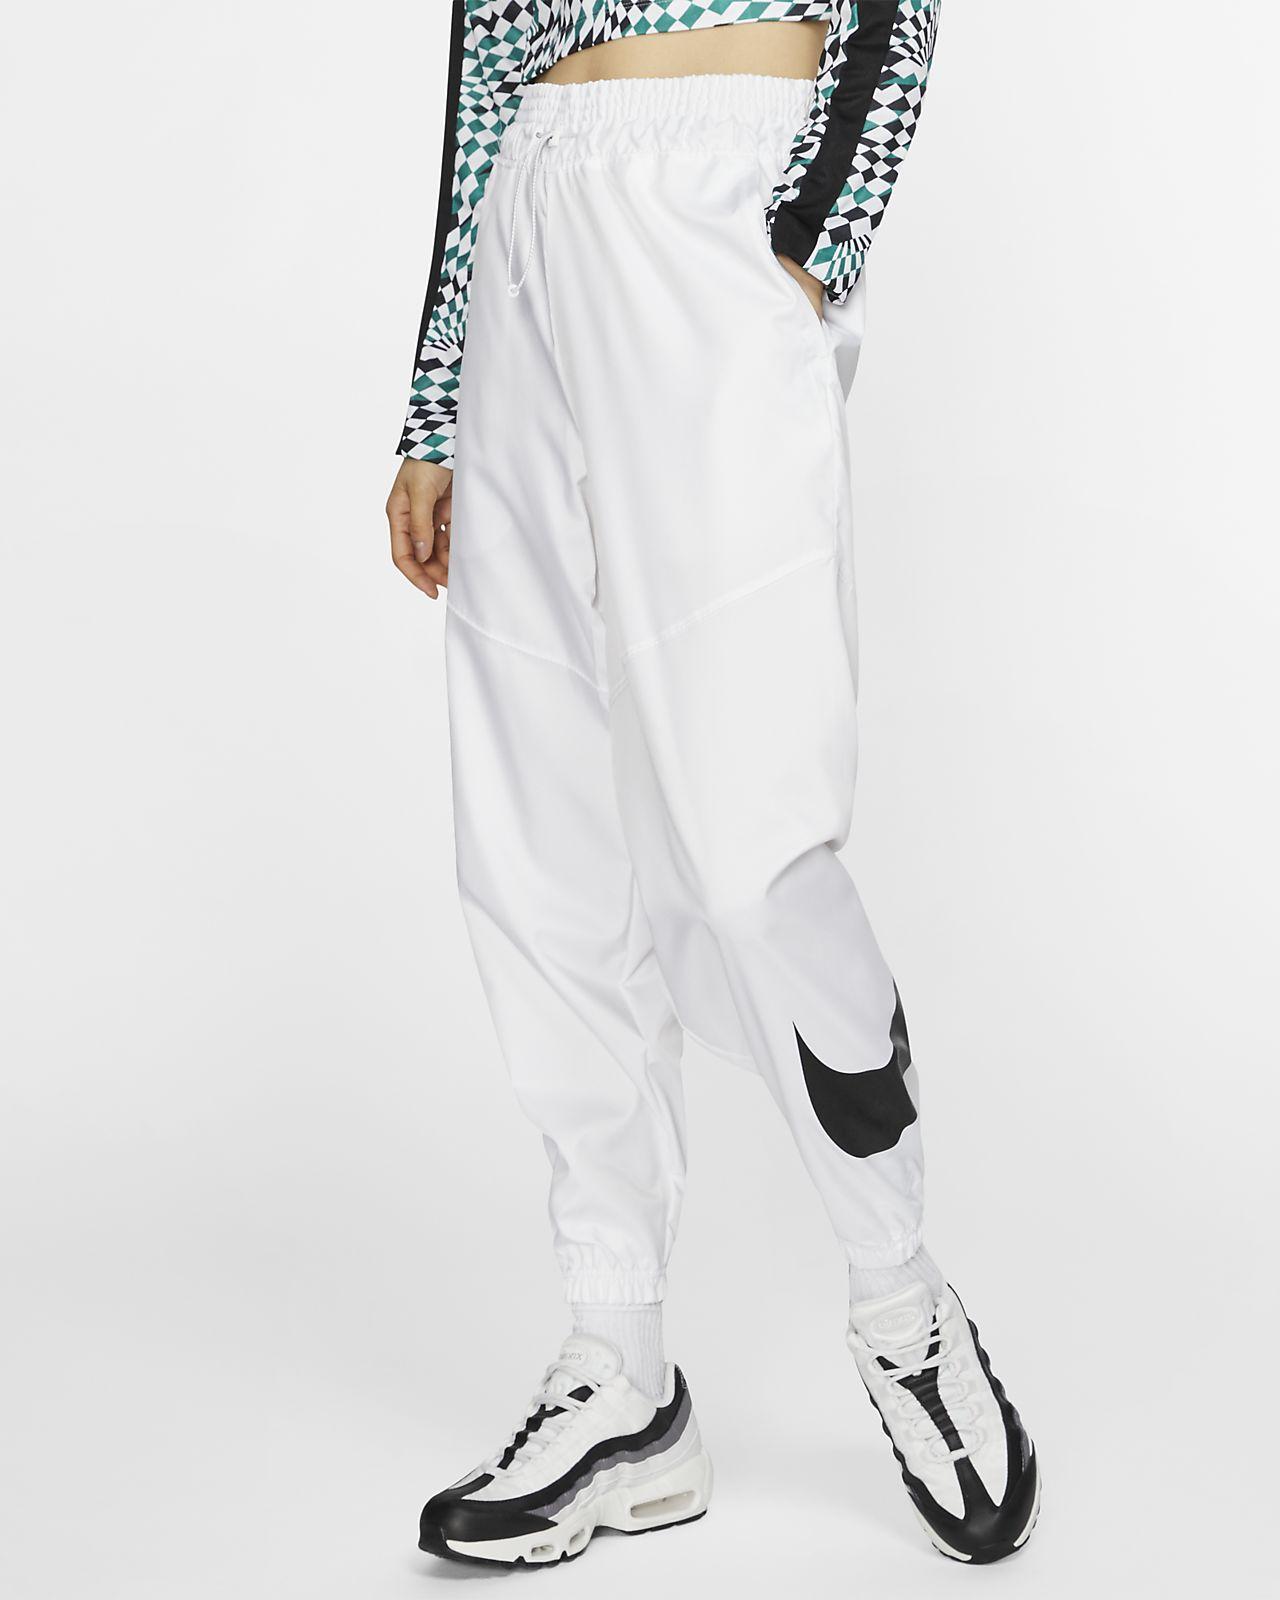 Pantaloni in woven Nike Sportswear Swoosh